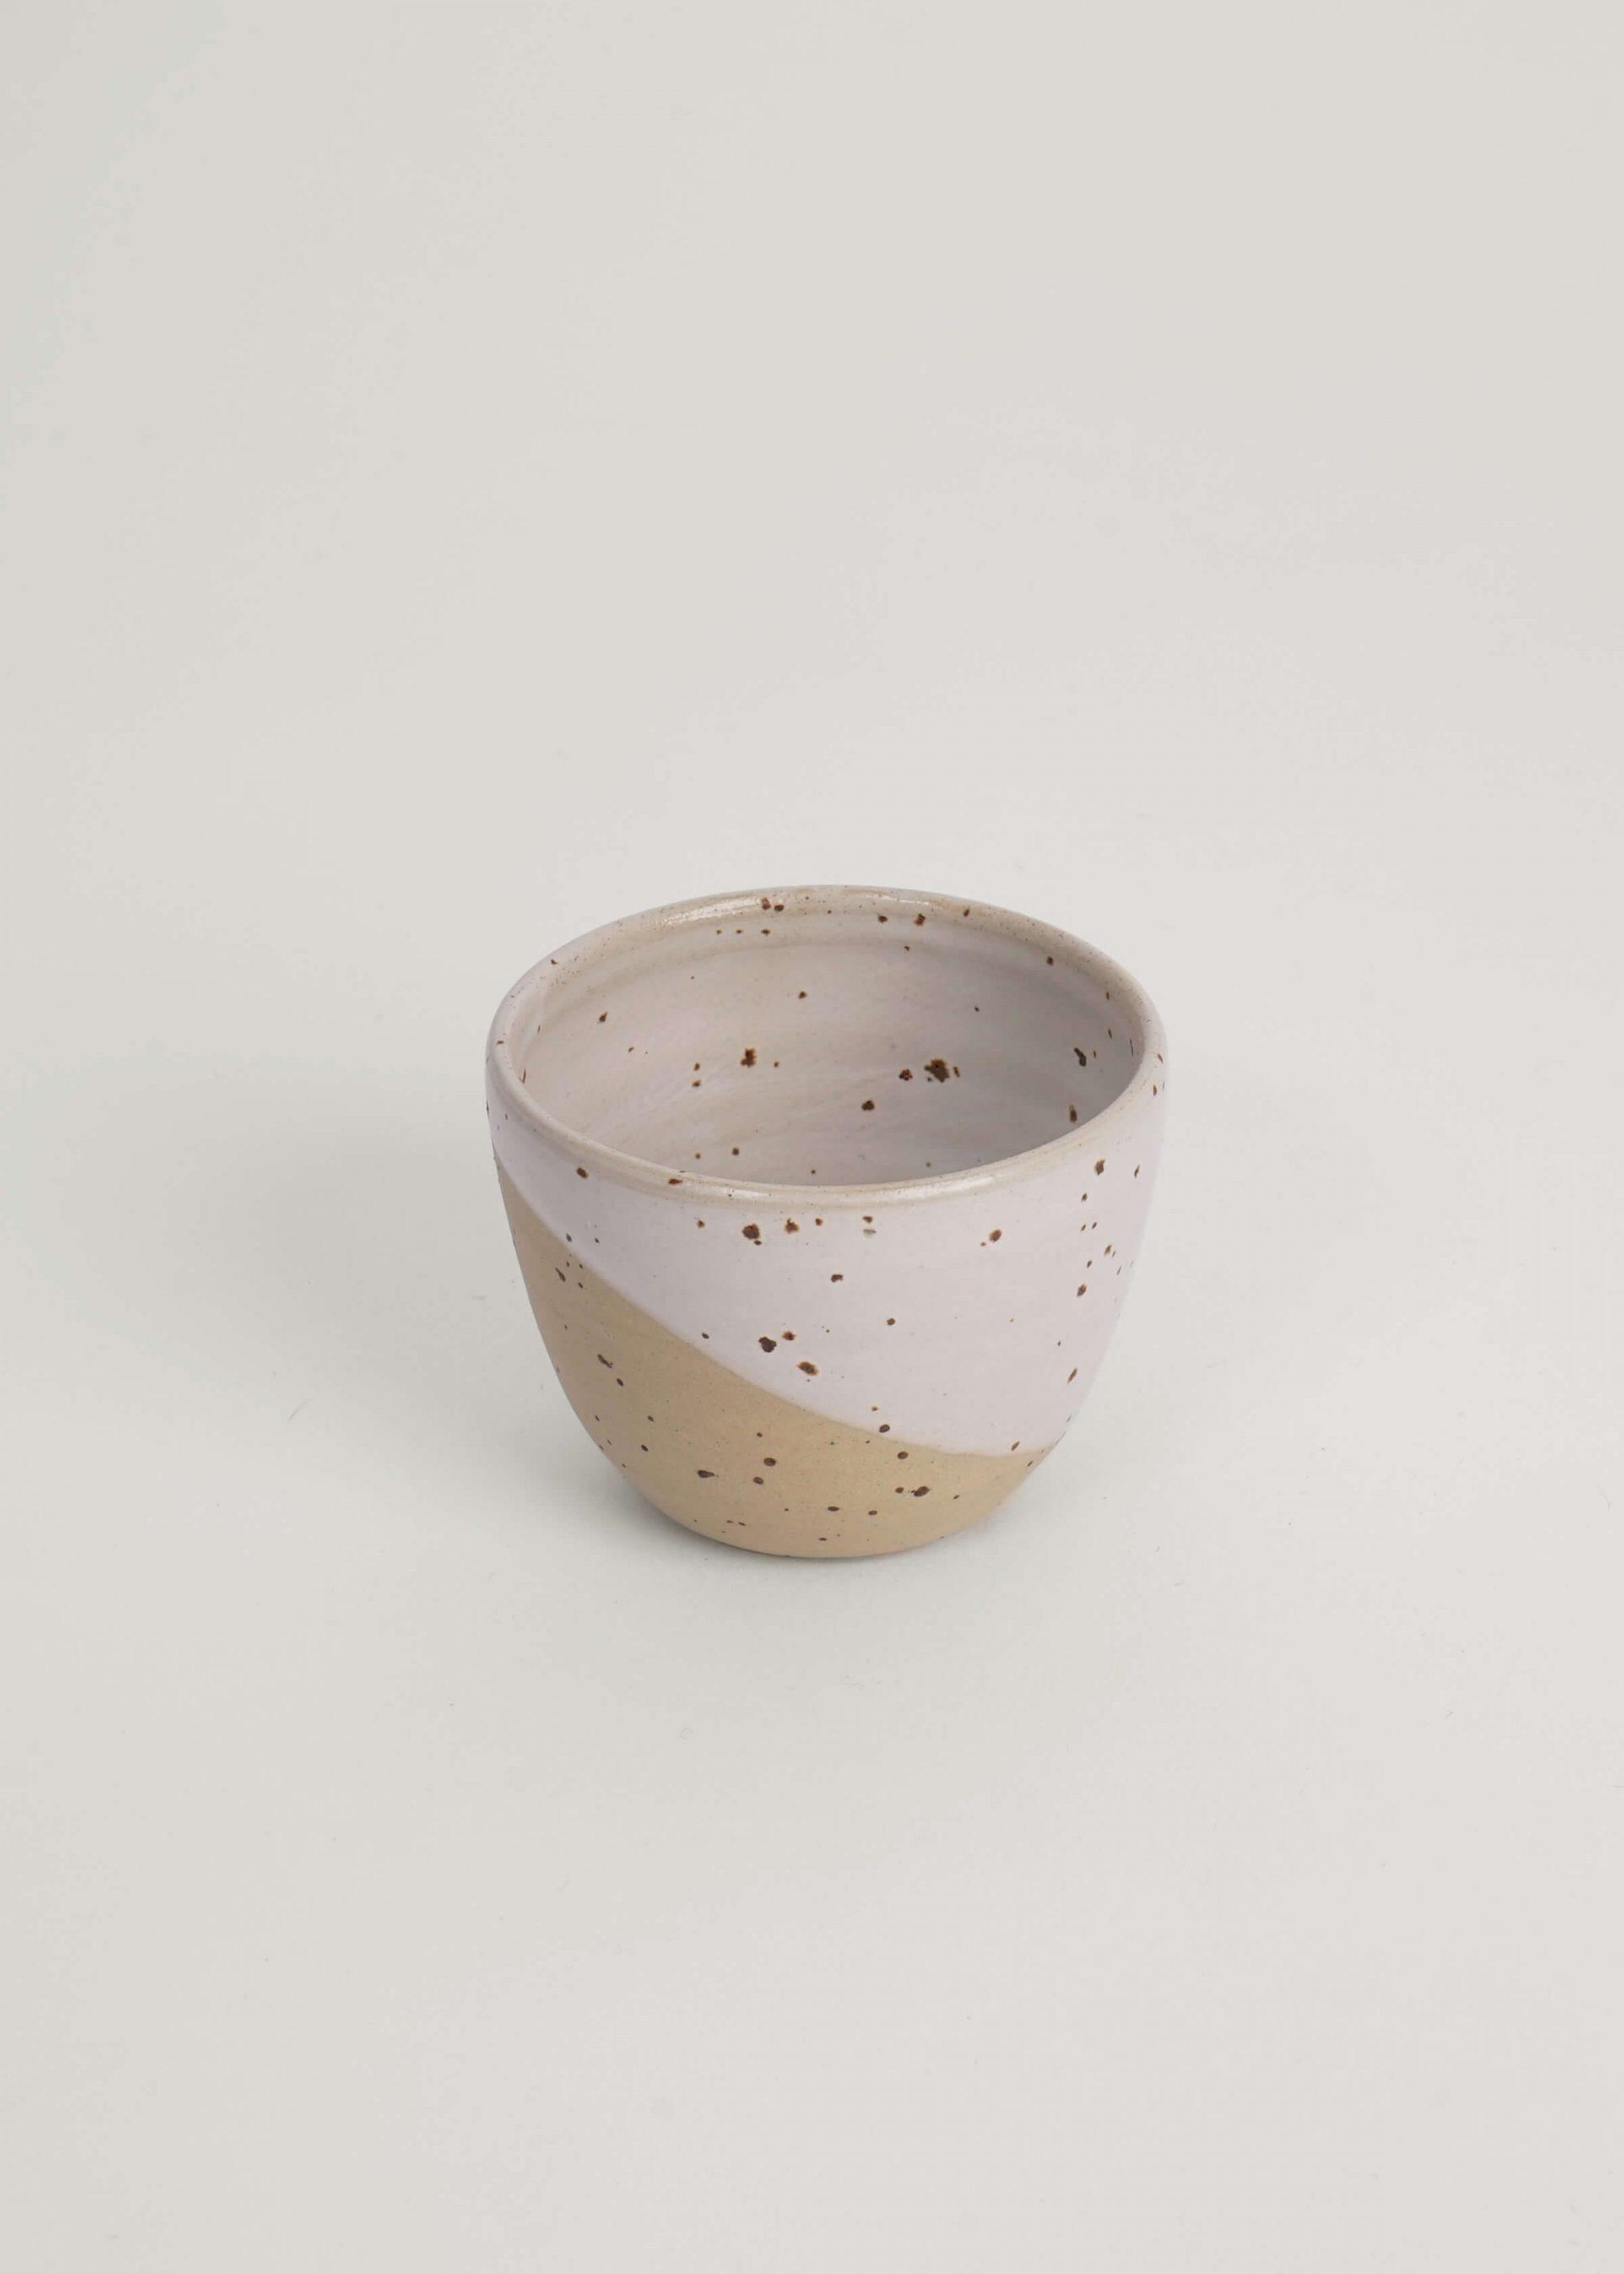 Product image for N° ICF4 Lobe Espresso Sake